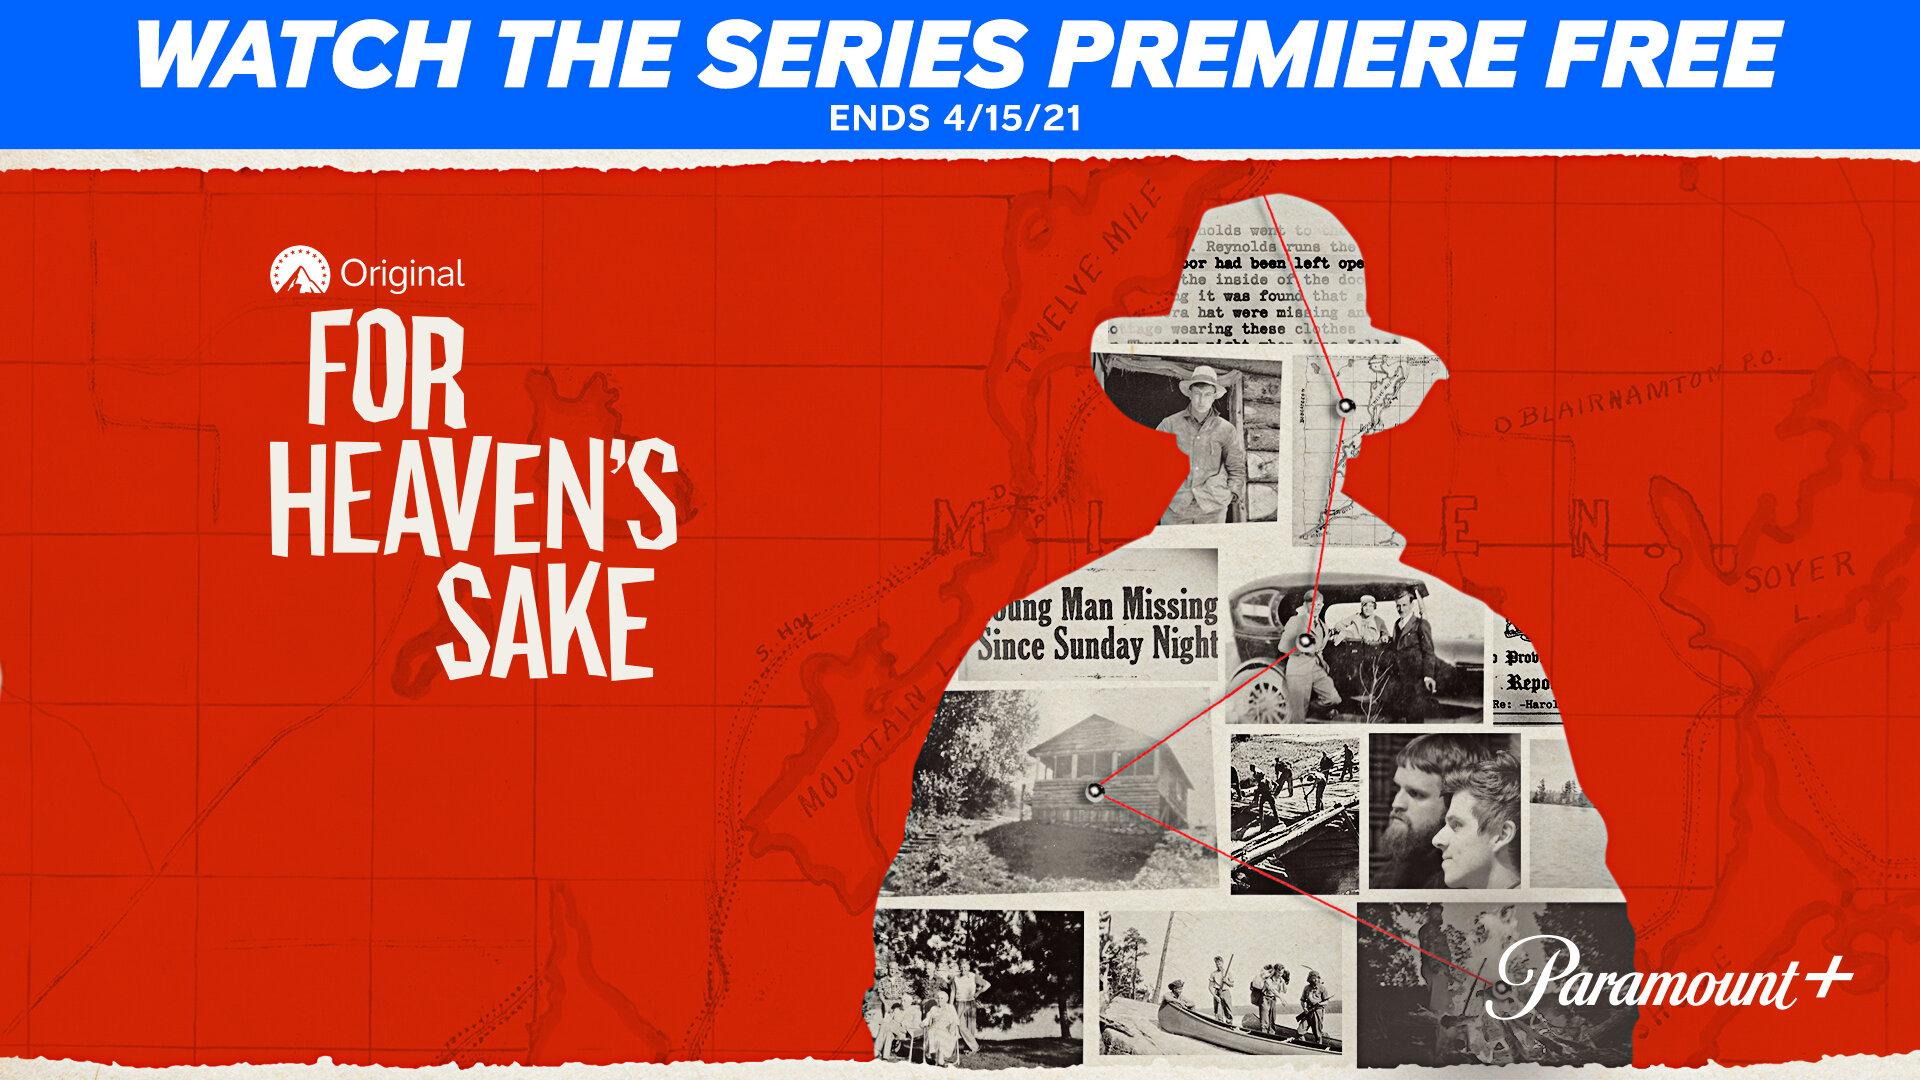 For Heaven's Sake Season 1